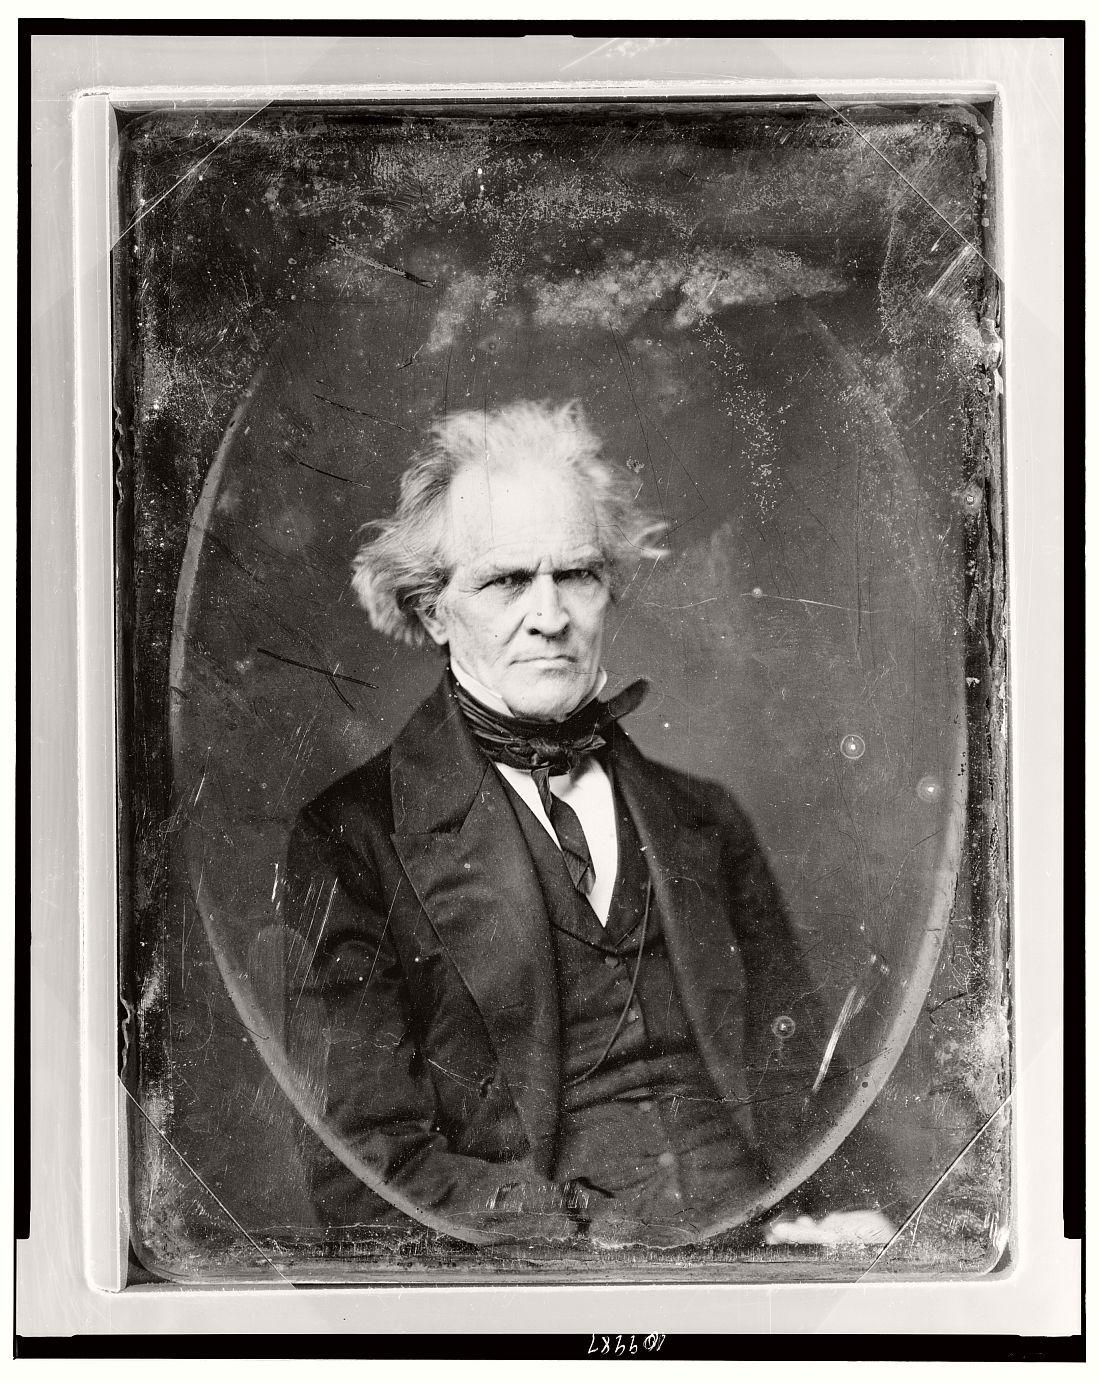 vintage-daguerreotype-portraits-from-xix-century-1844-1860-40